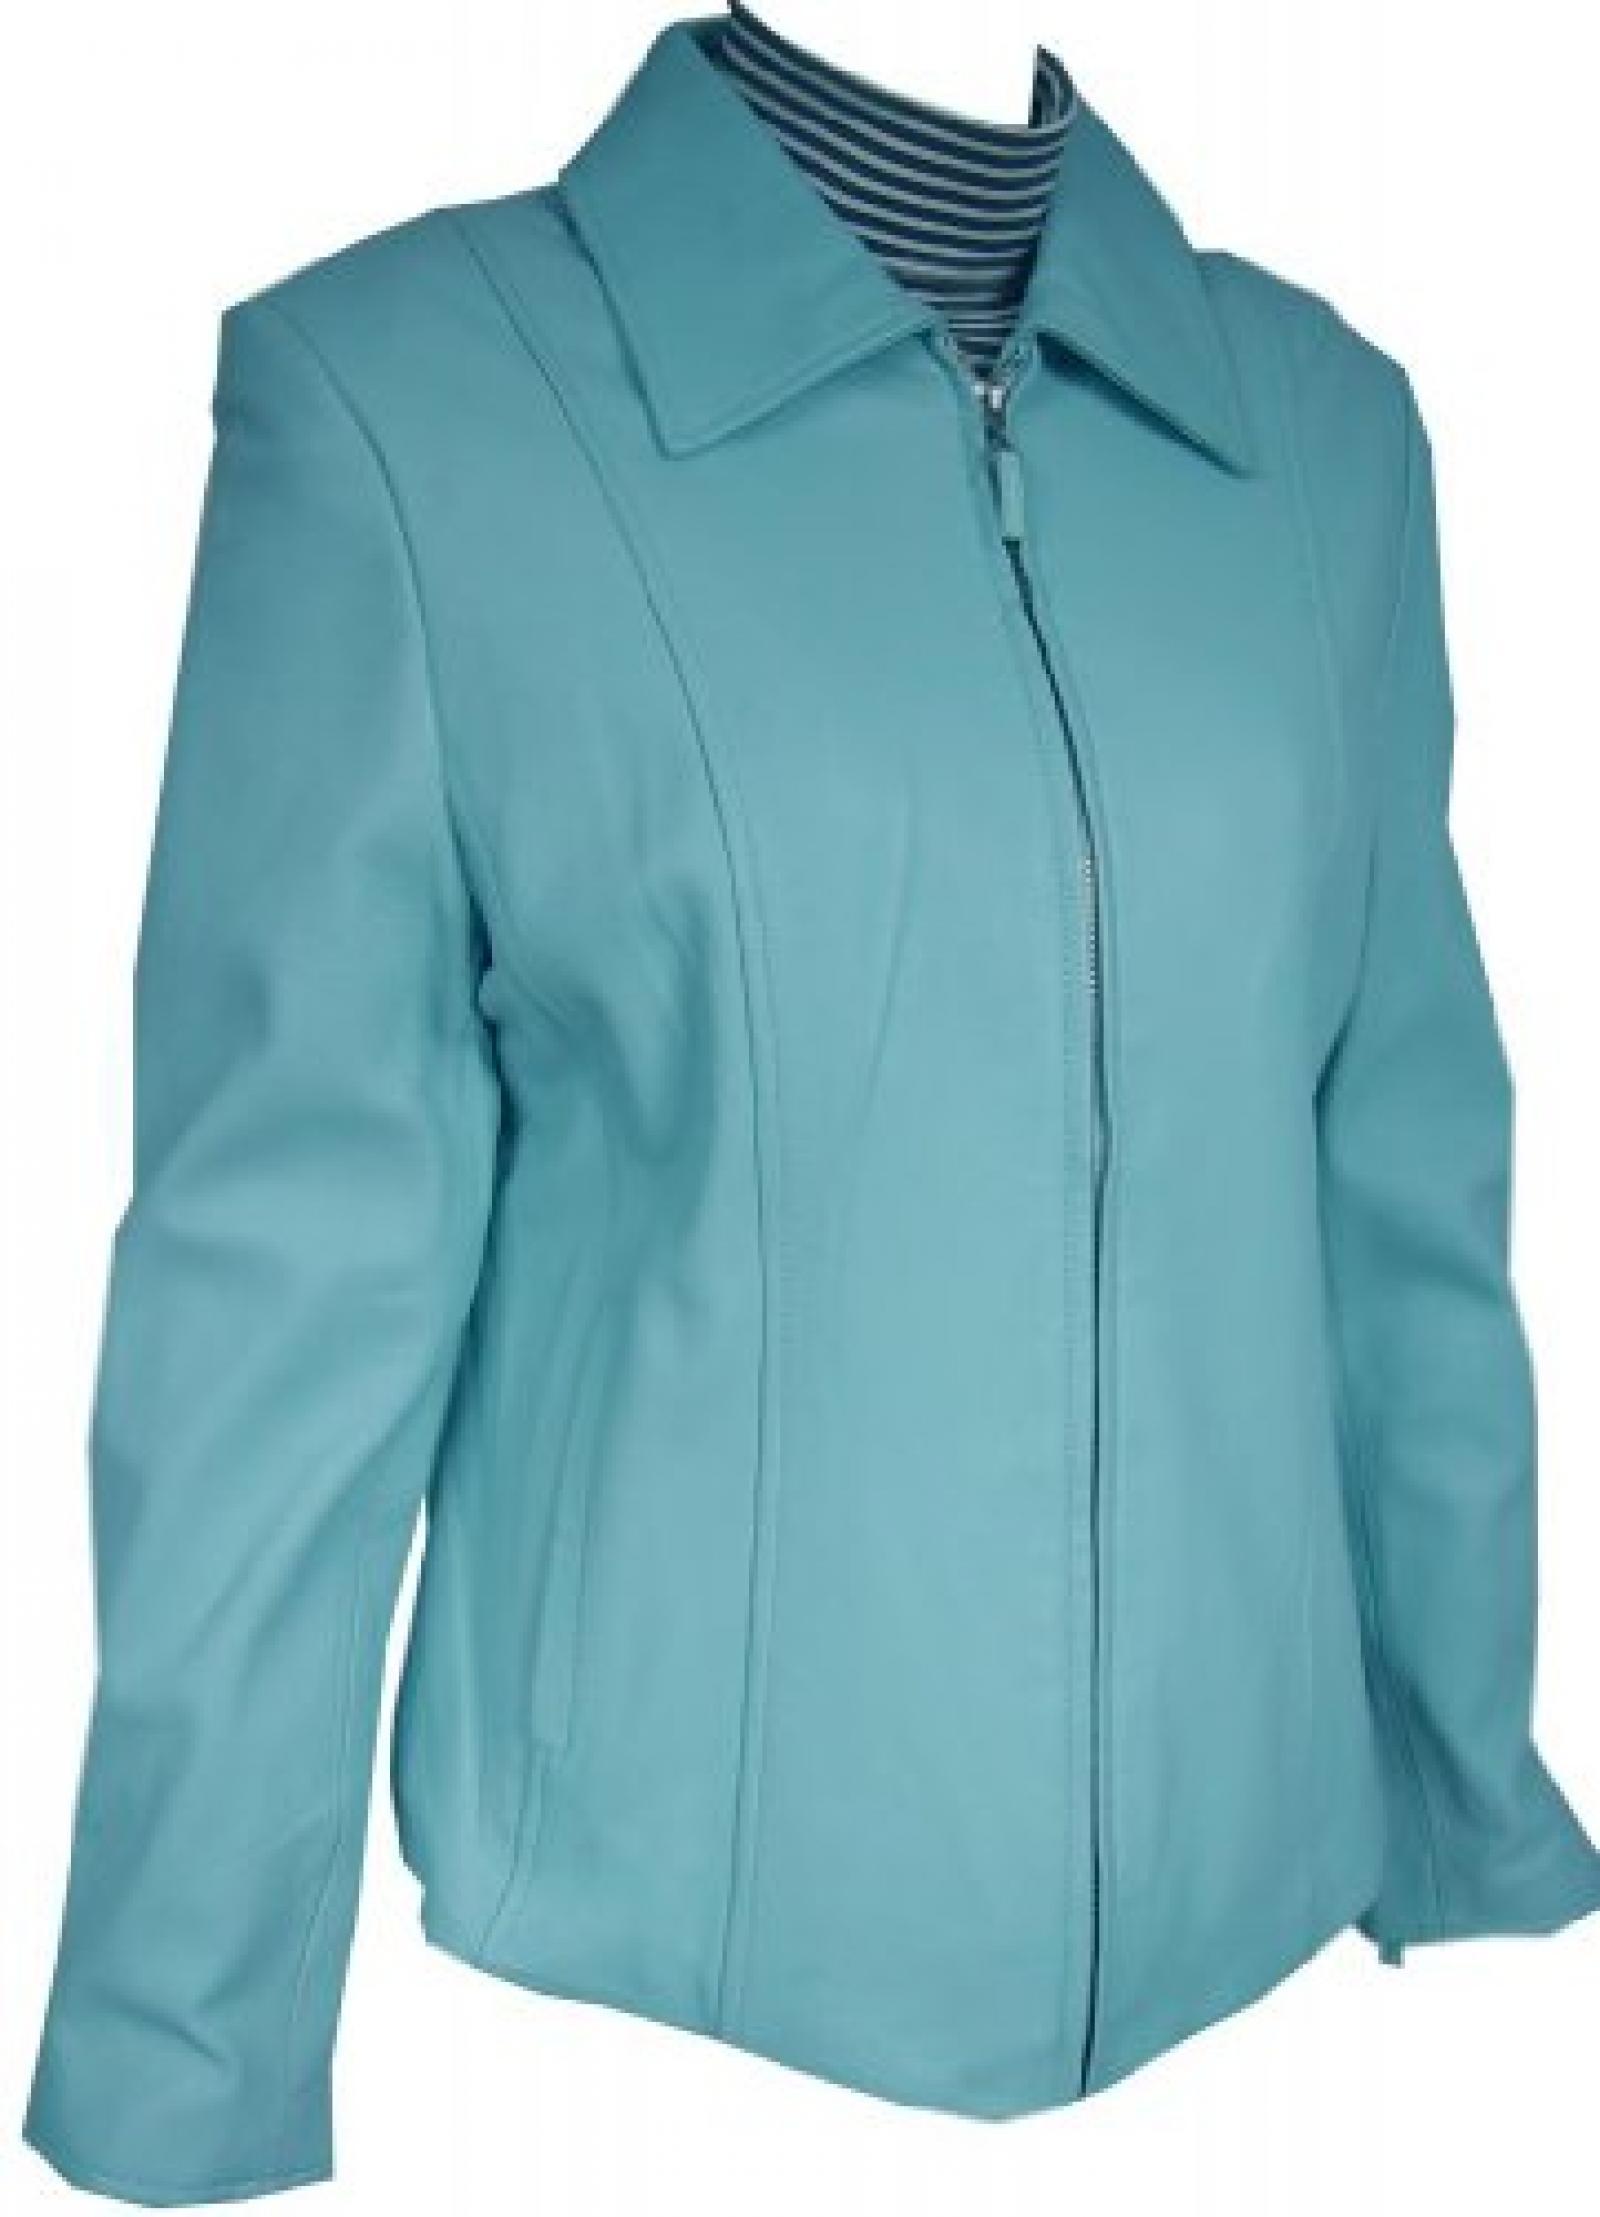 Paccilo FREE tailoring Women 4032 Plus Size Lambskin Leather Scuba Jacket